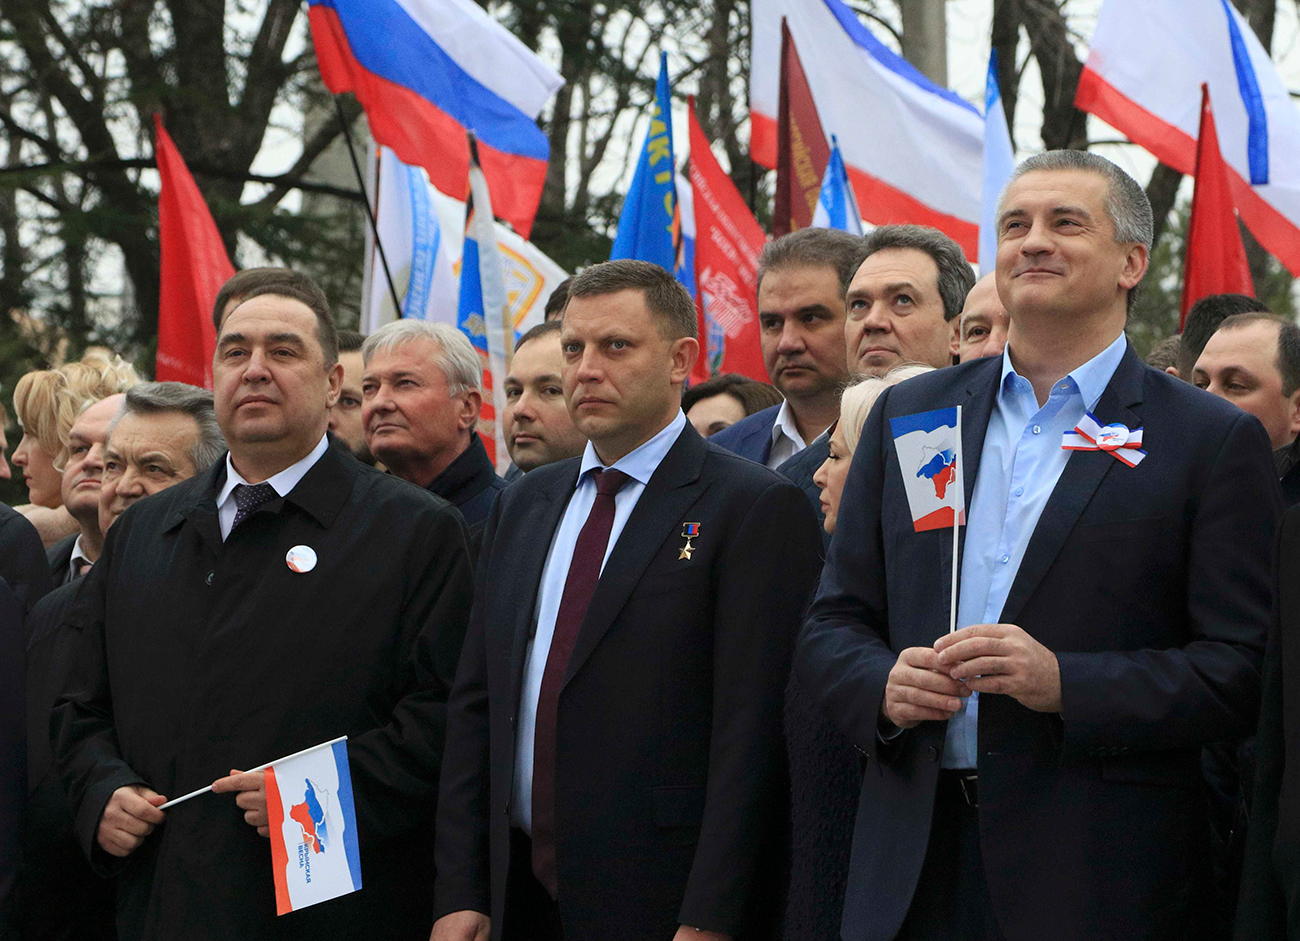 Igor Plotnitsky, leader of LNR, Alexander Zakharchenko, the head of DNR, and Sergei Aksyonov, the Crimean Prime Minister, Simferopol, March 16, 2017. / Photo: Reuters